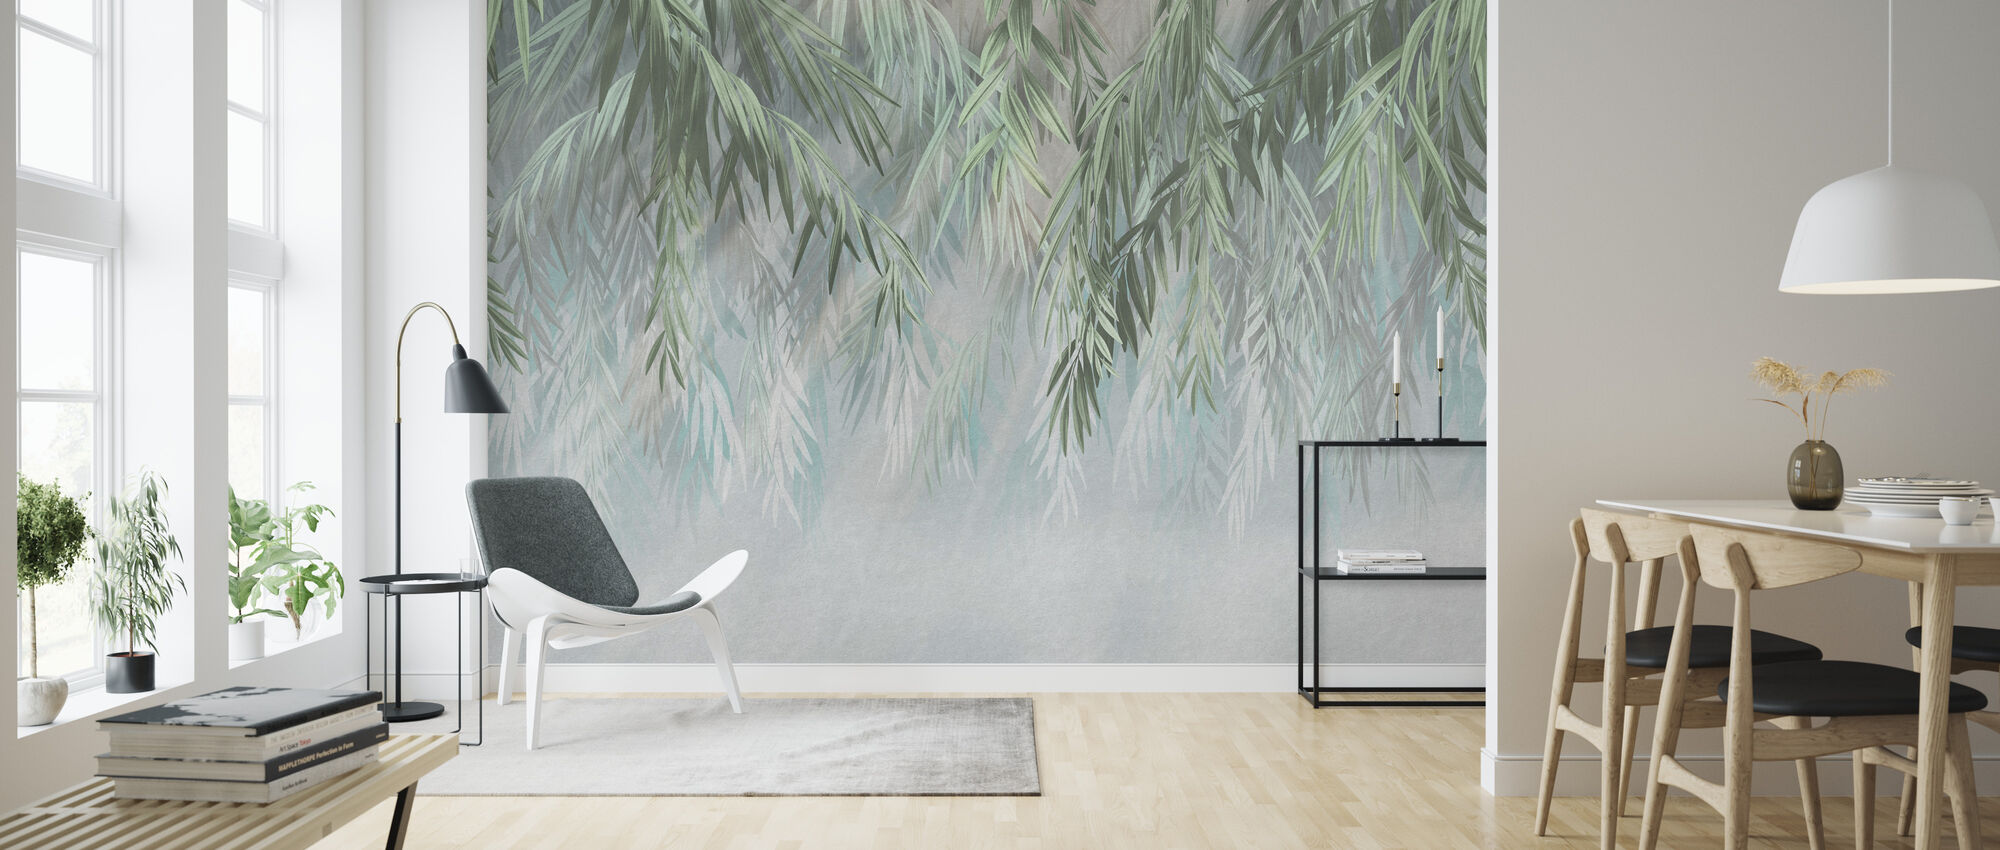 Tropical Gleam - Wallpaper - Living Room